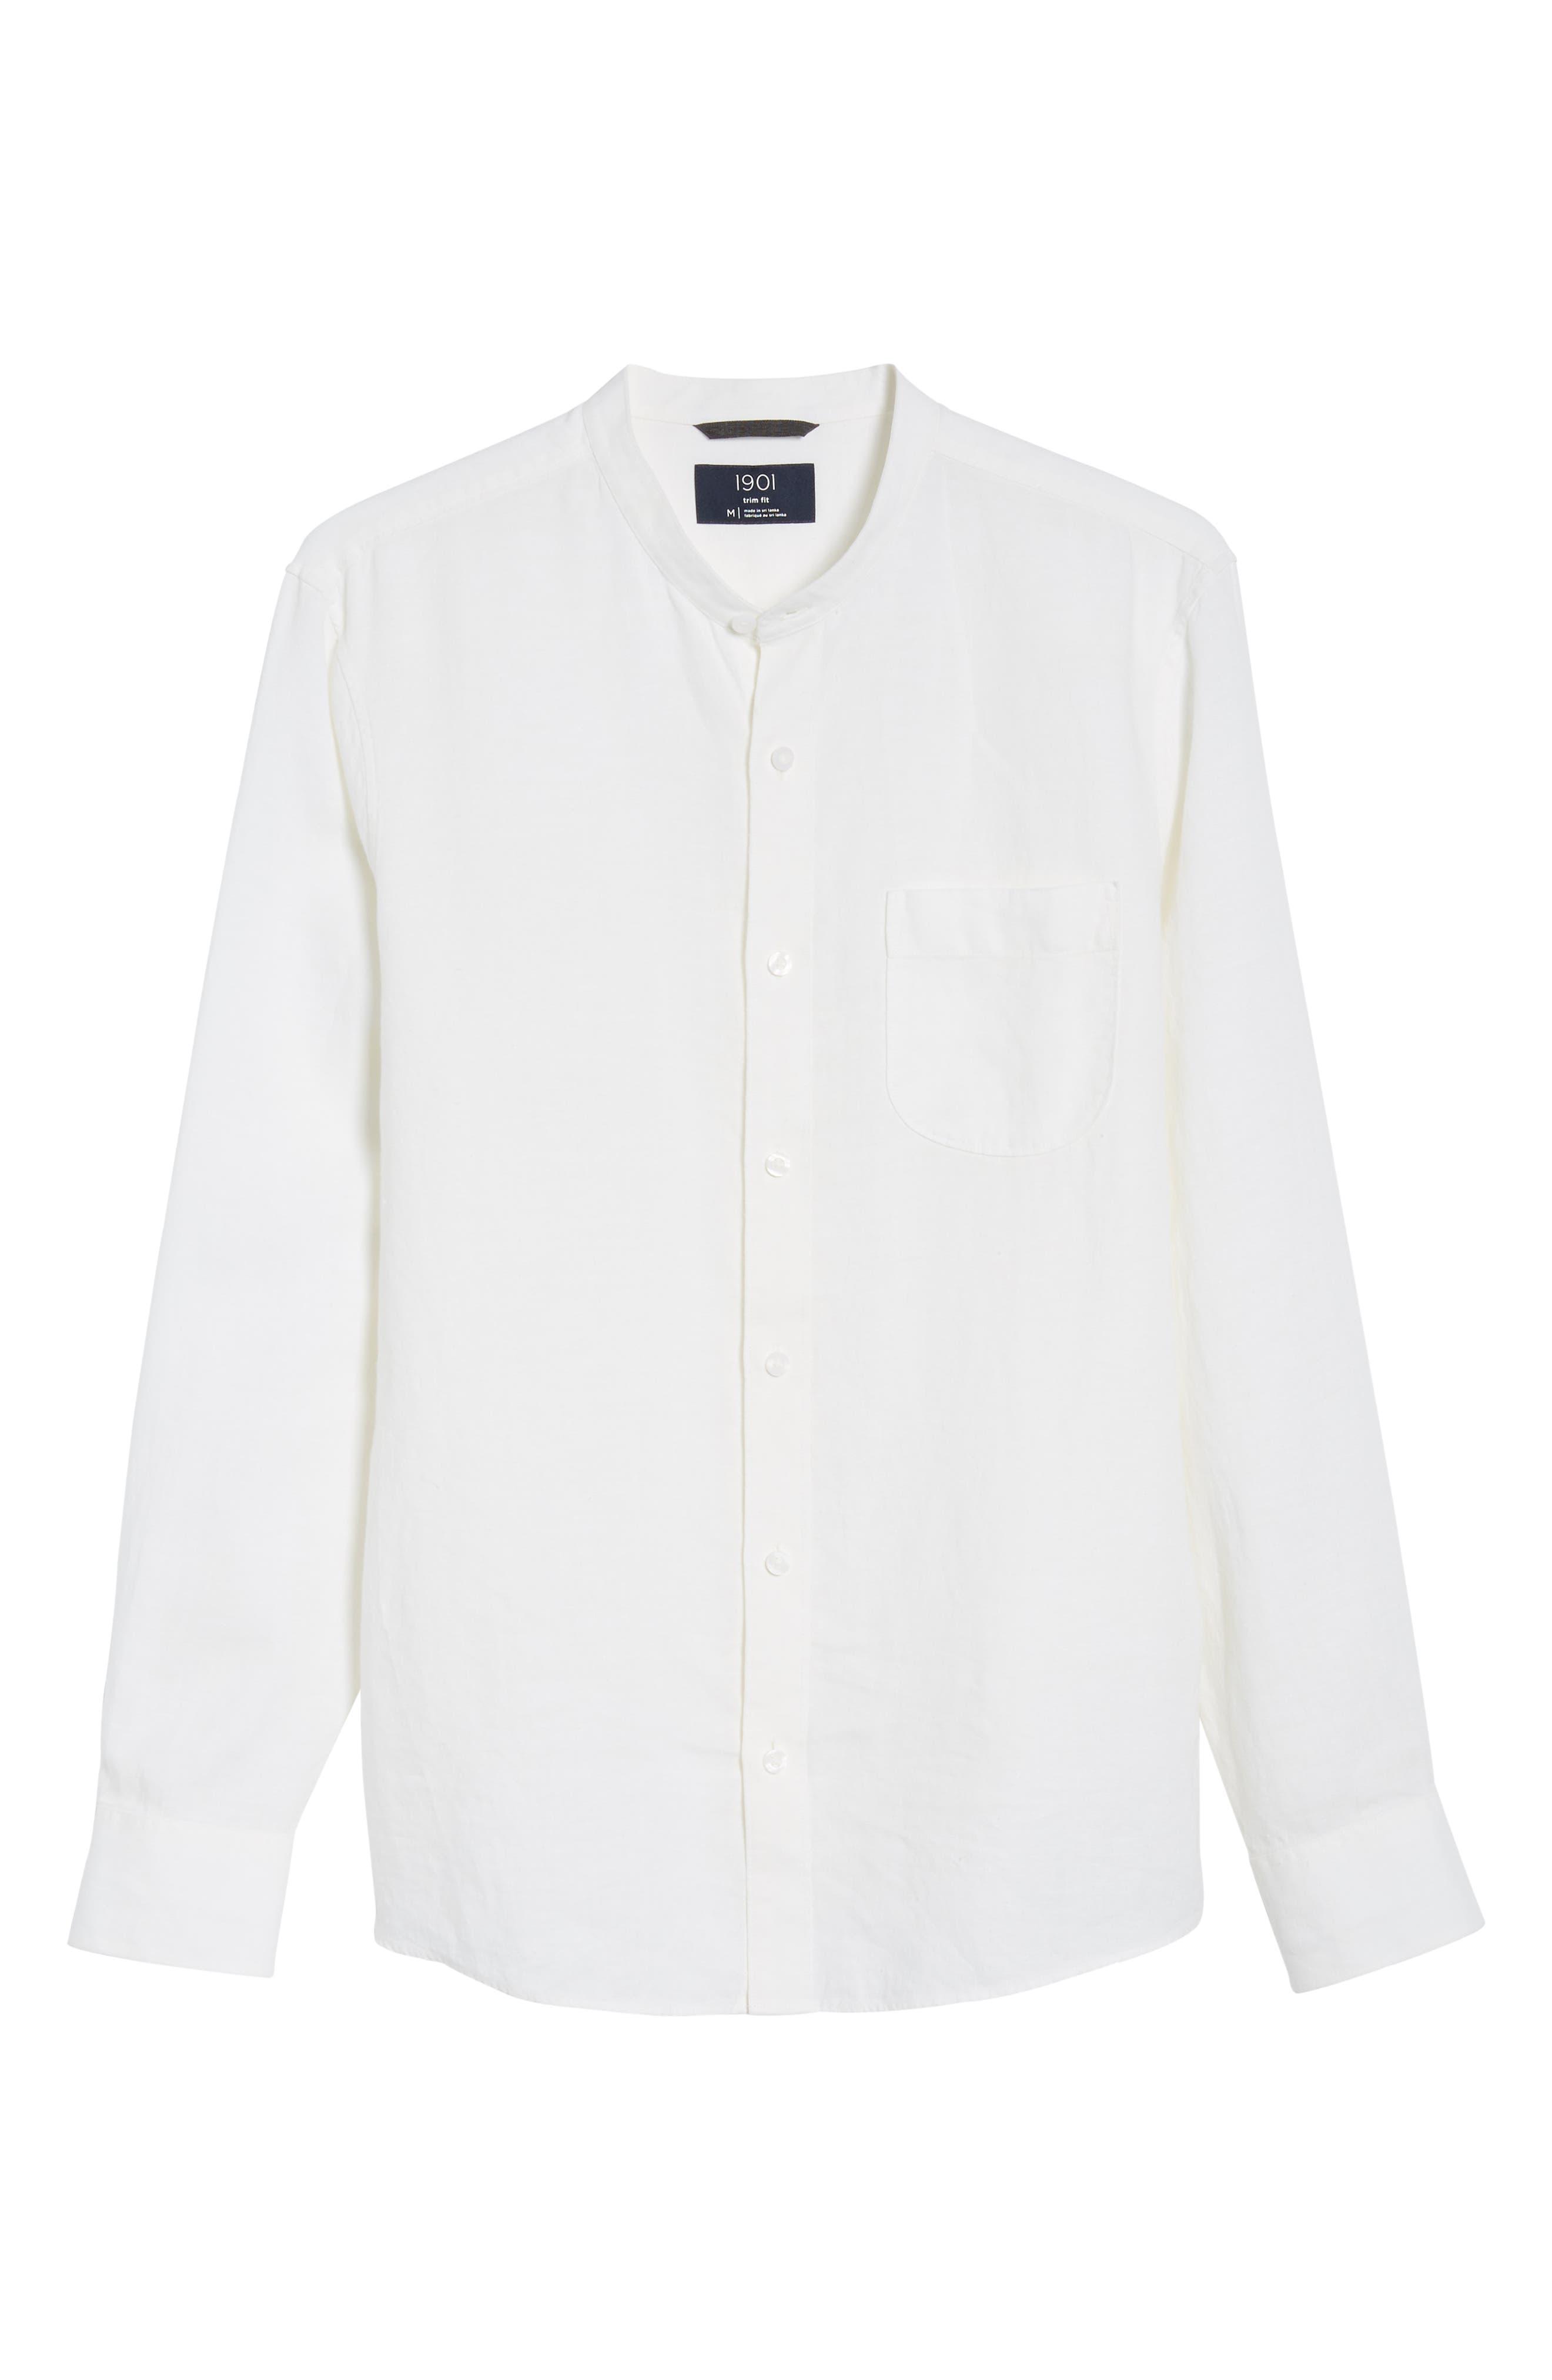 Band Collar Linen Sport Shirt,                             Alternate thumbnail 6, color,                             100